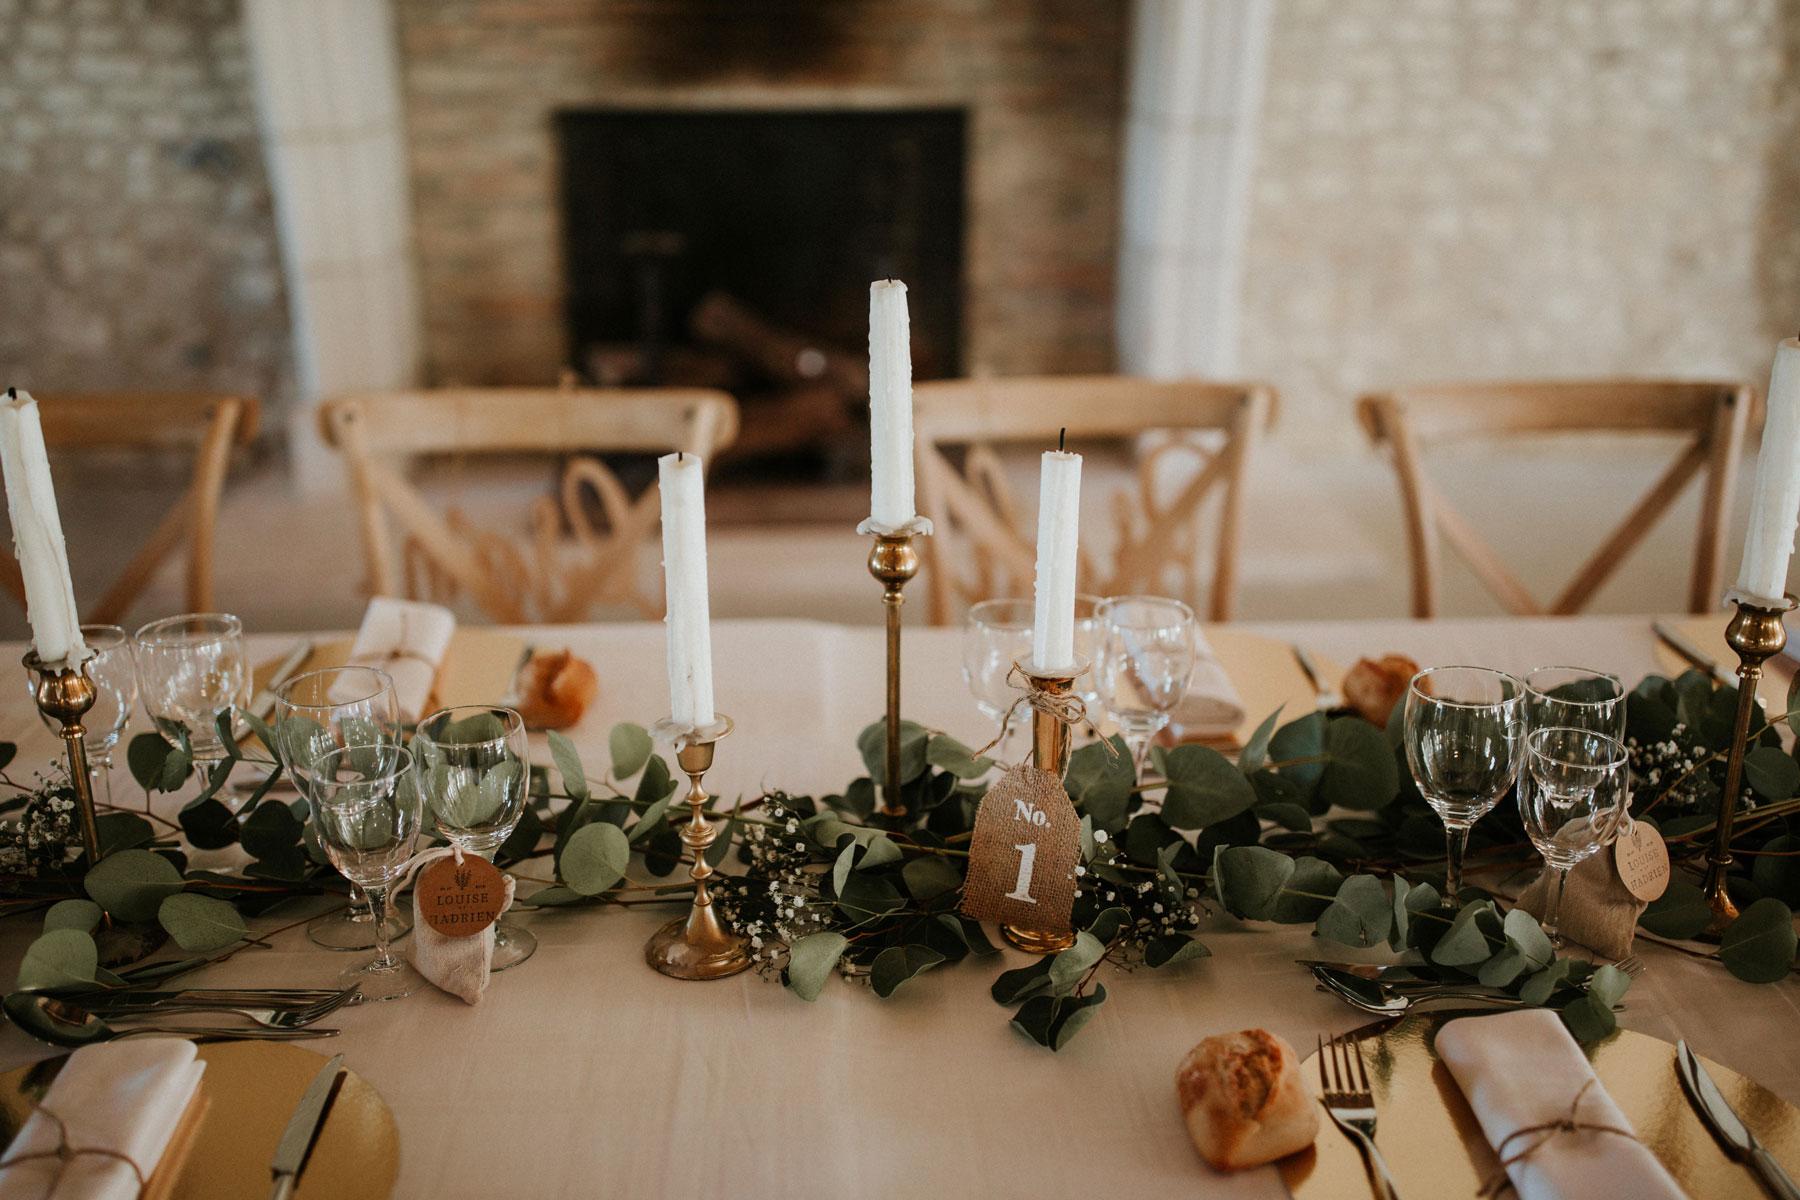 Mariage-naturel-et-vegetal-chemin-de-table-eucalyptus-bougeoirs-dore-table-honneur-studio-aloki